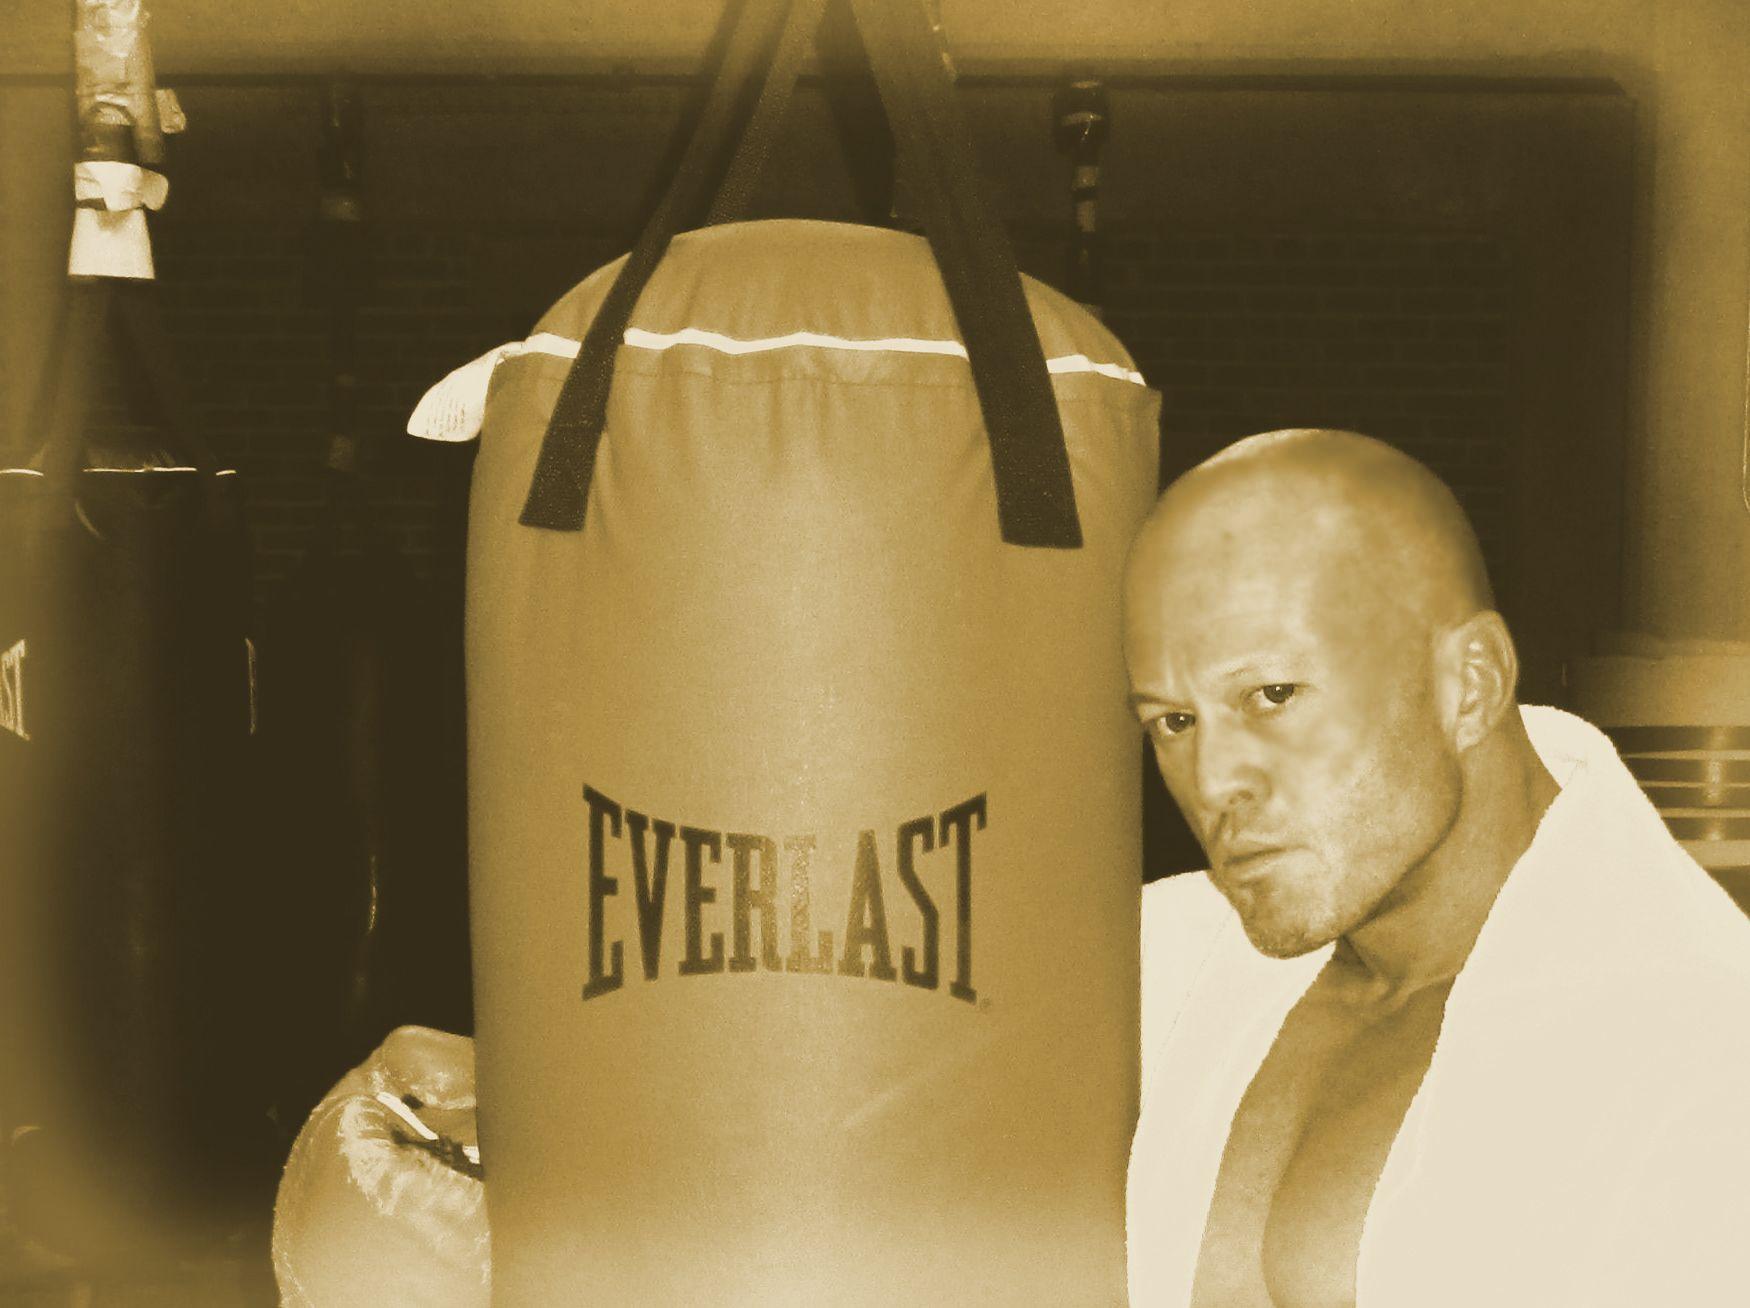 Tattooed Boston Physique Model & Actor John Joseph Quinlan 2015 Pilot Film Series Project Boxing Training @ Everlast #JohnQuinlan